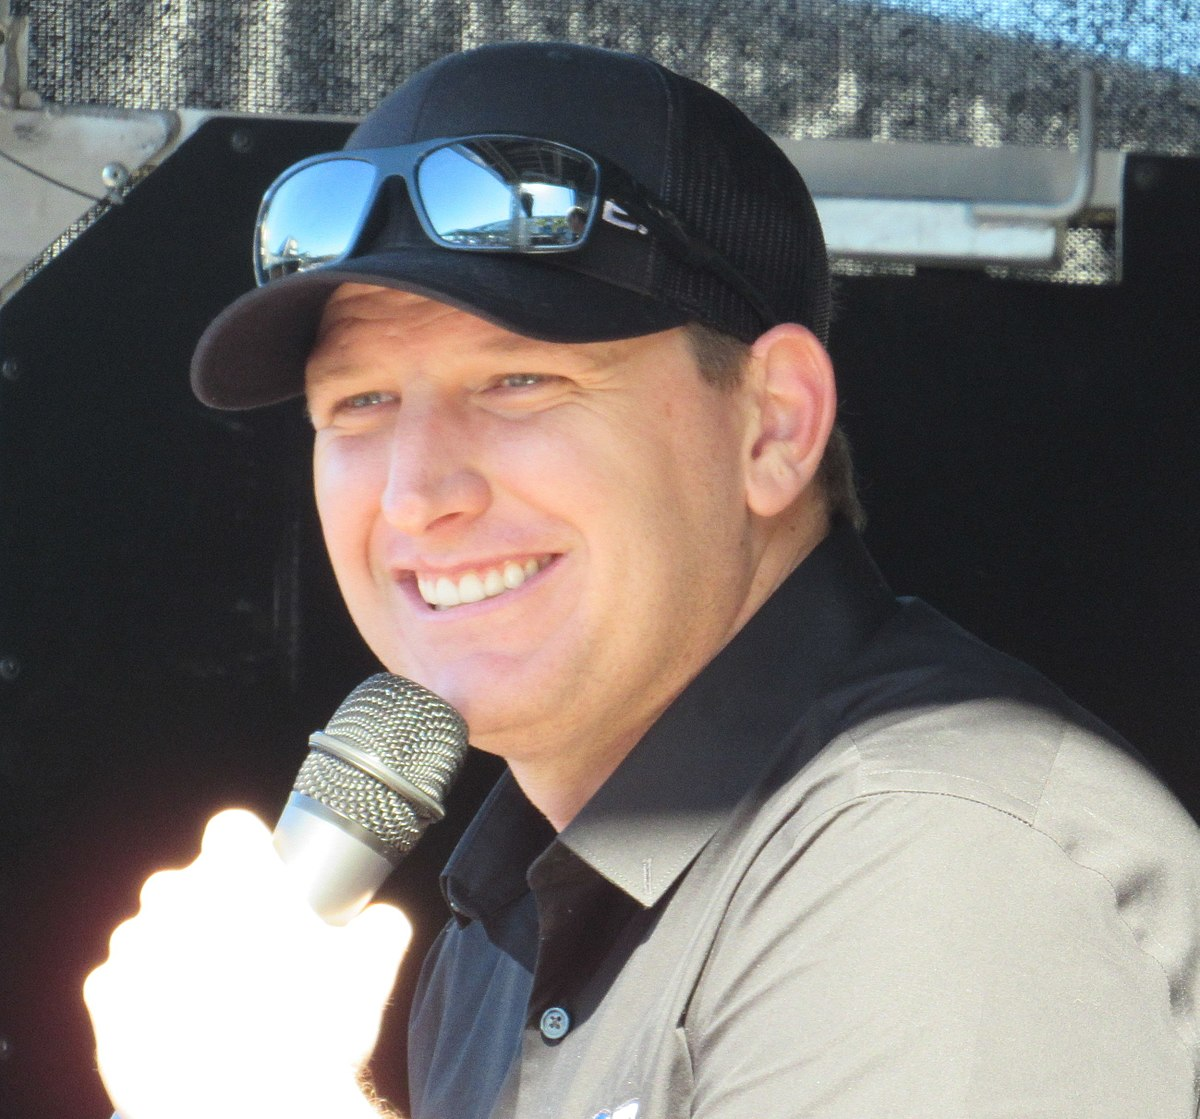 Michael McDowell Racing Driver Wikipedia